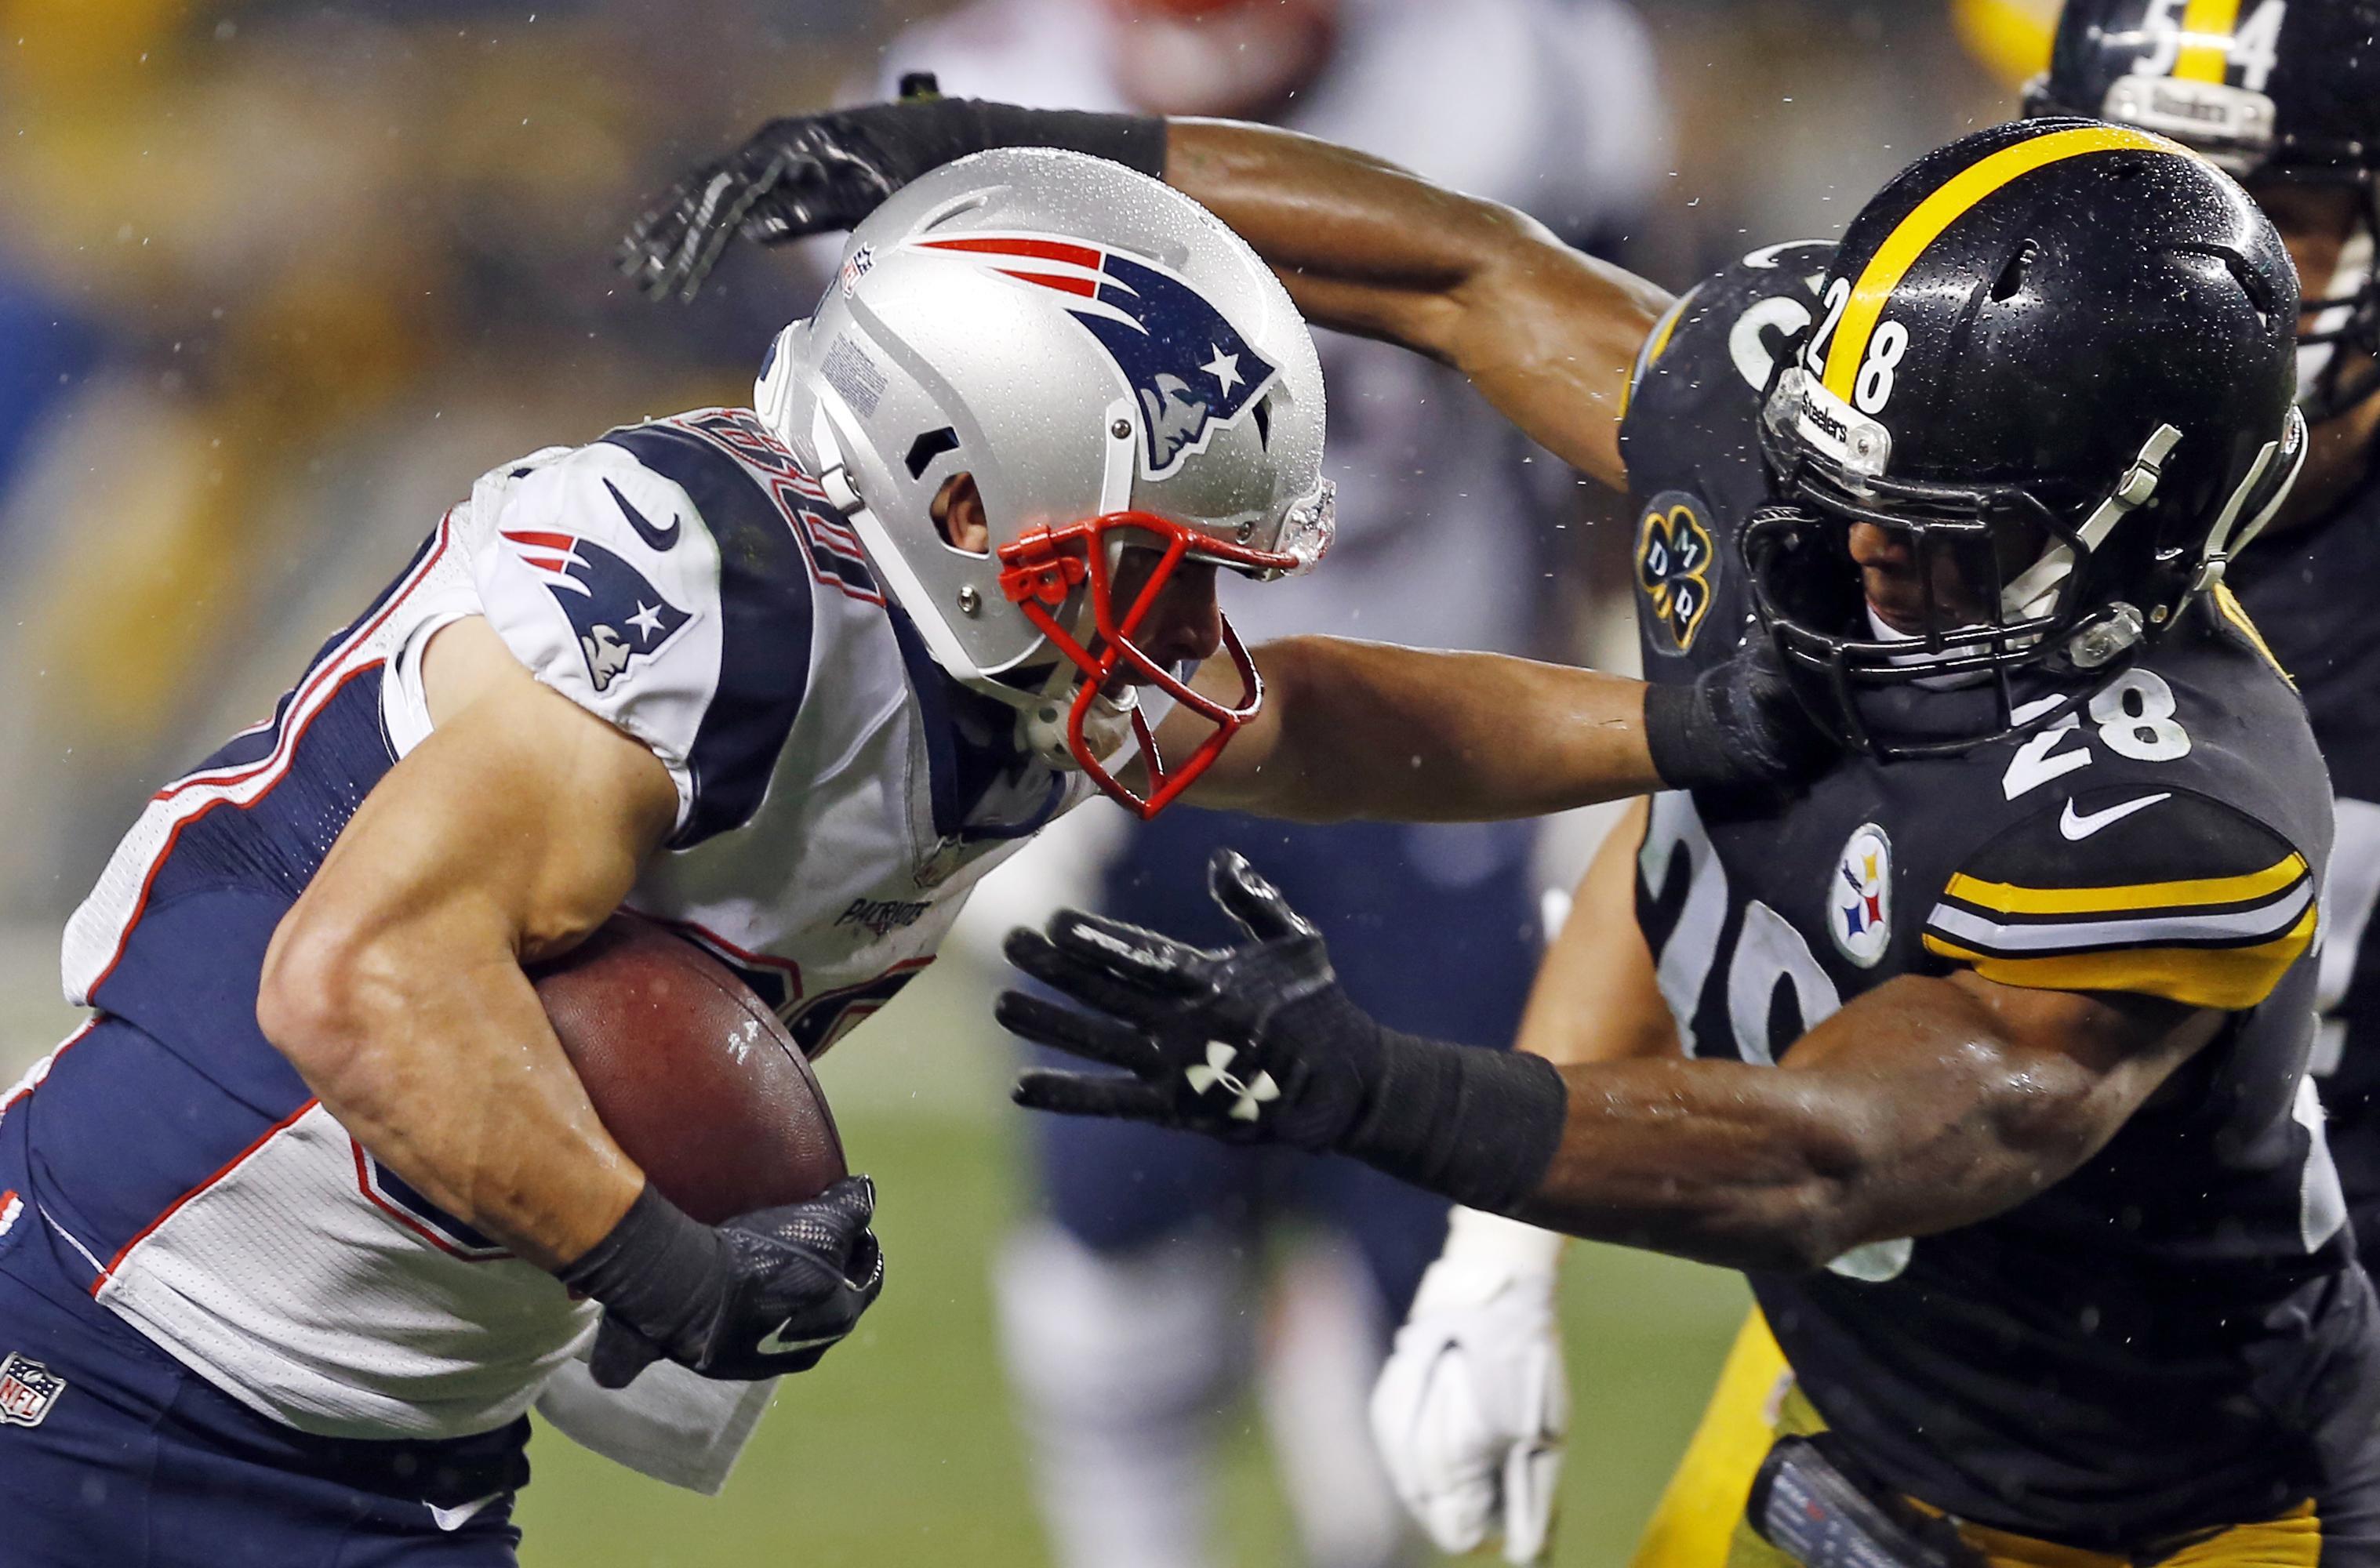 33dcfd856 New England Patriots wide receiver Danny Amendola